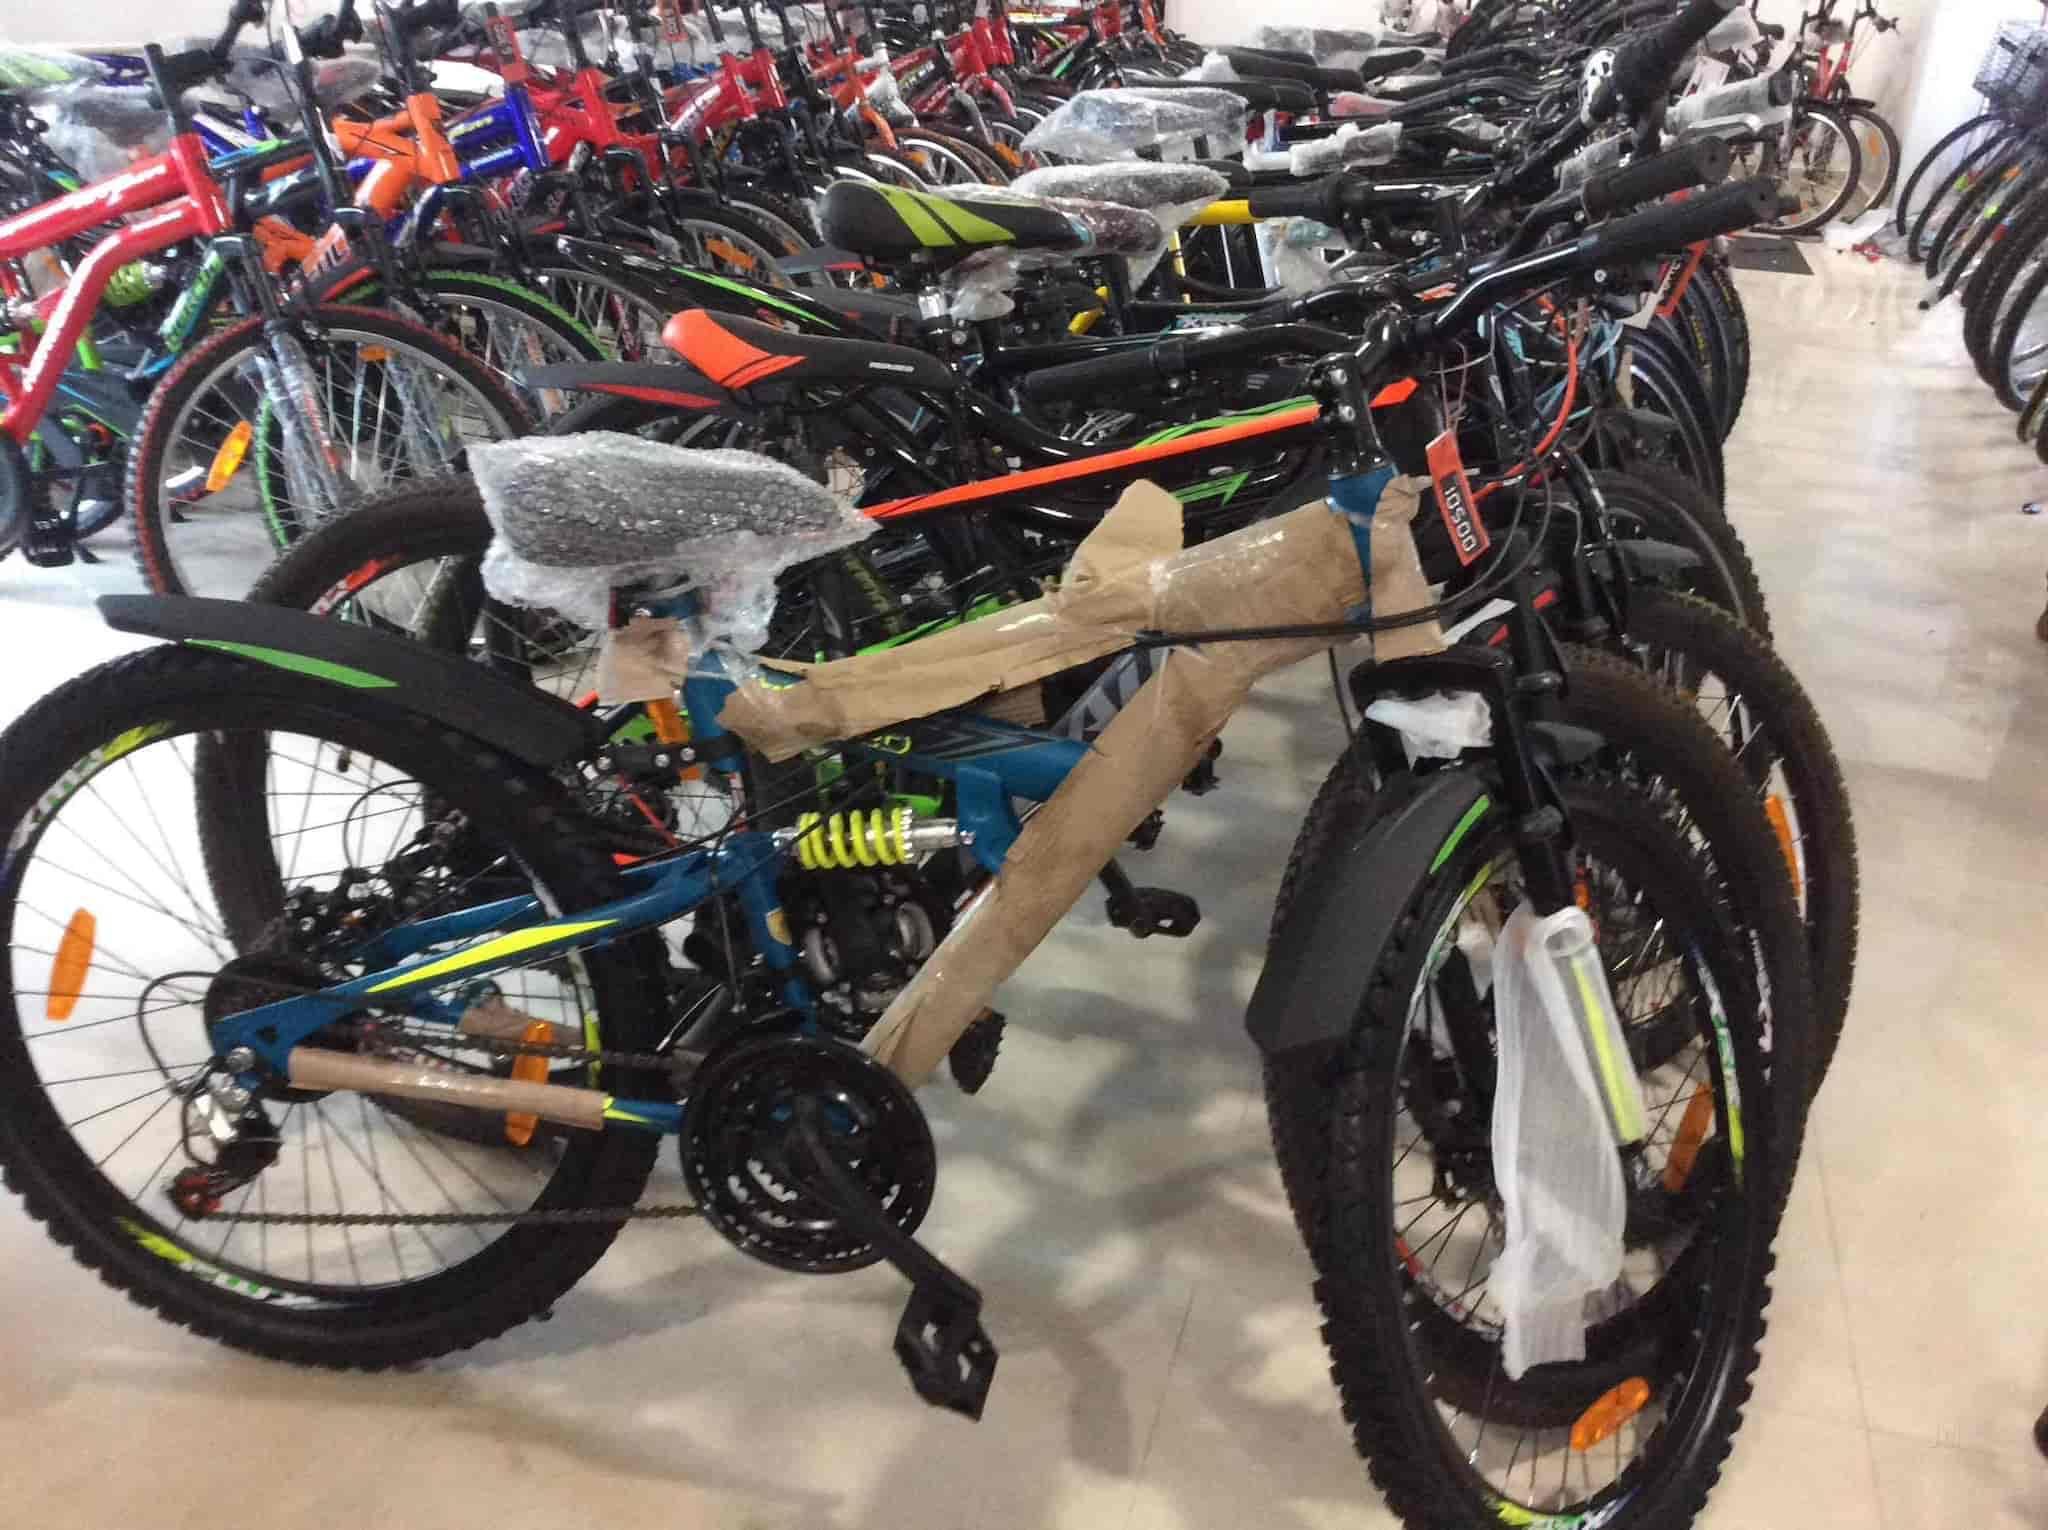 panjikaran cycle agencies cherthala bicycle dealers in alappuzha